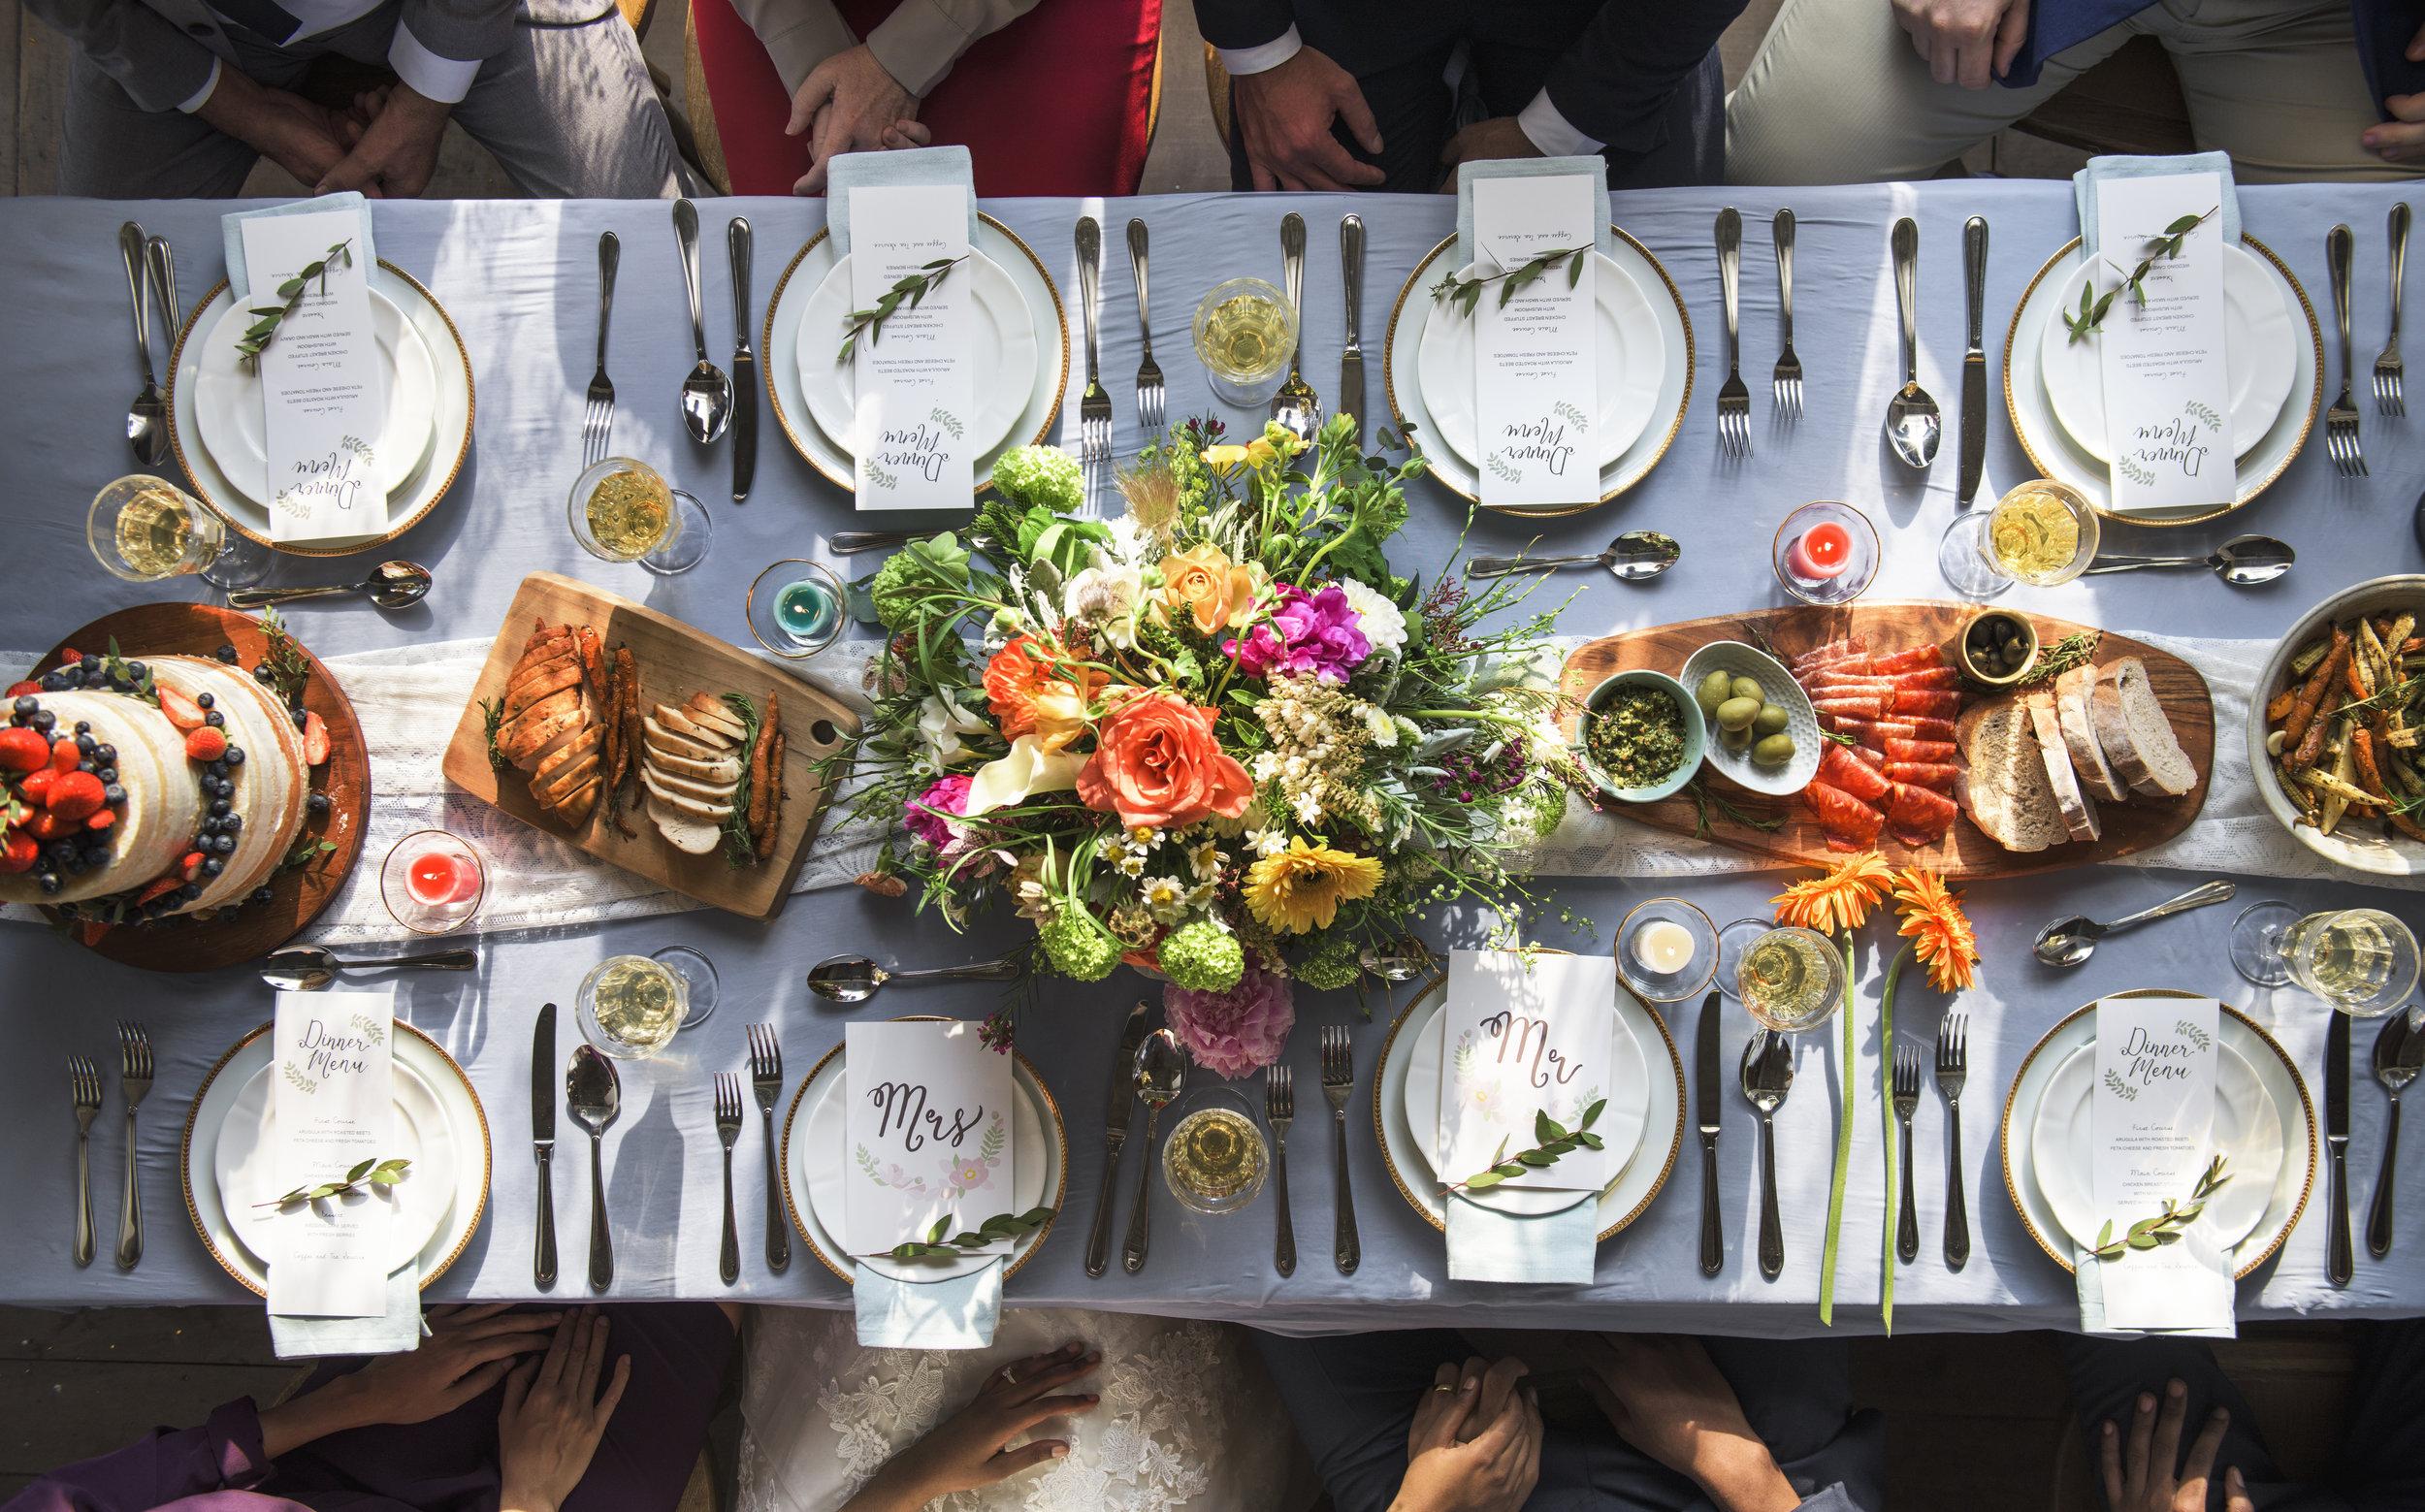 A long reception table at an outdoor wedding.